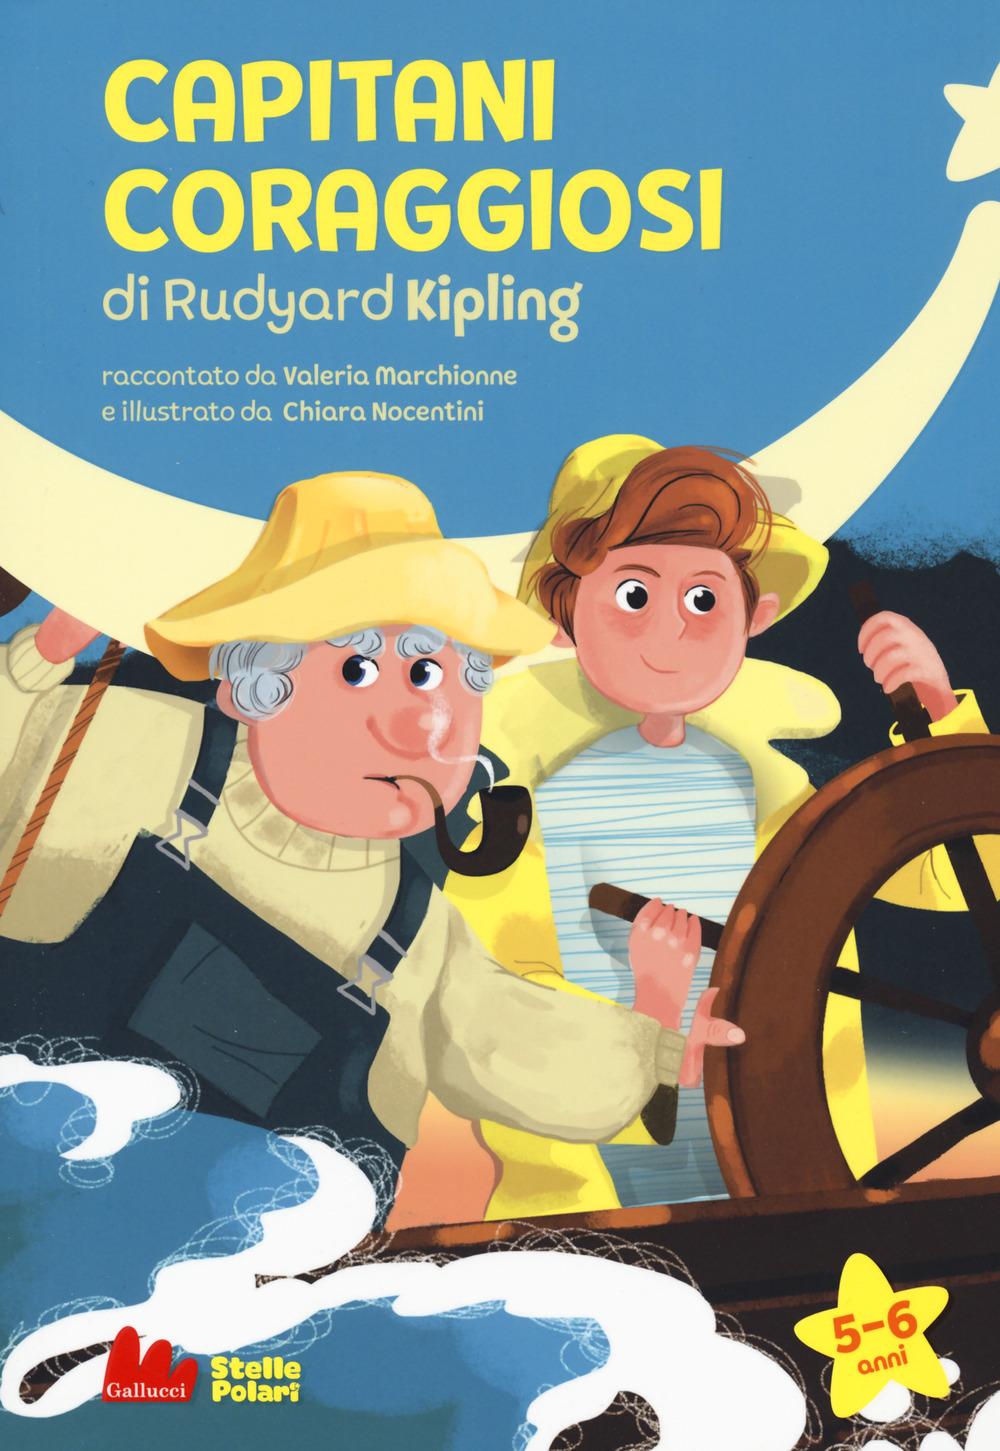 Capitani coraggiosi di Rudyard Kipling. Ediz. a caratteri grandi